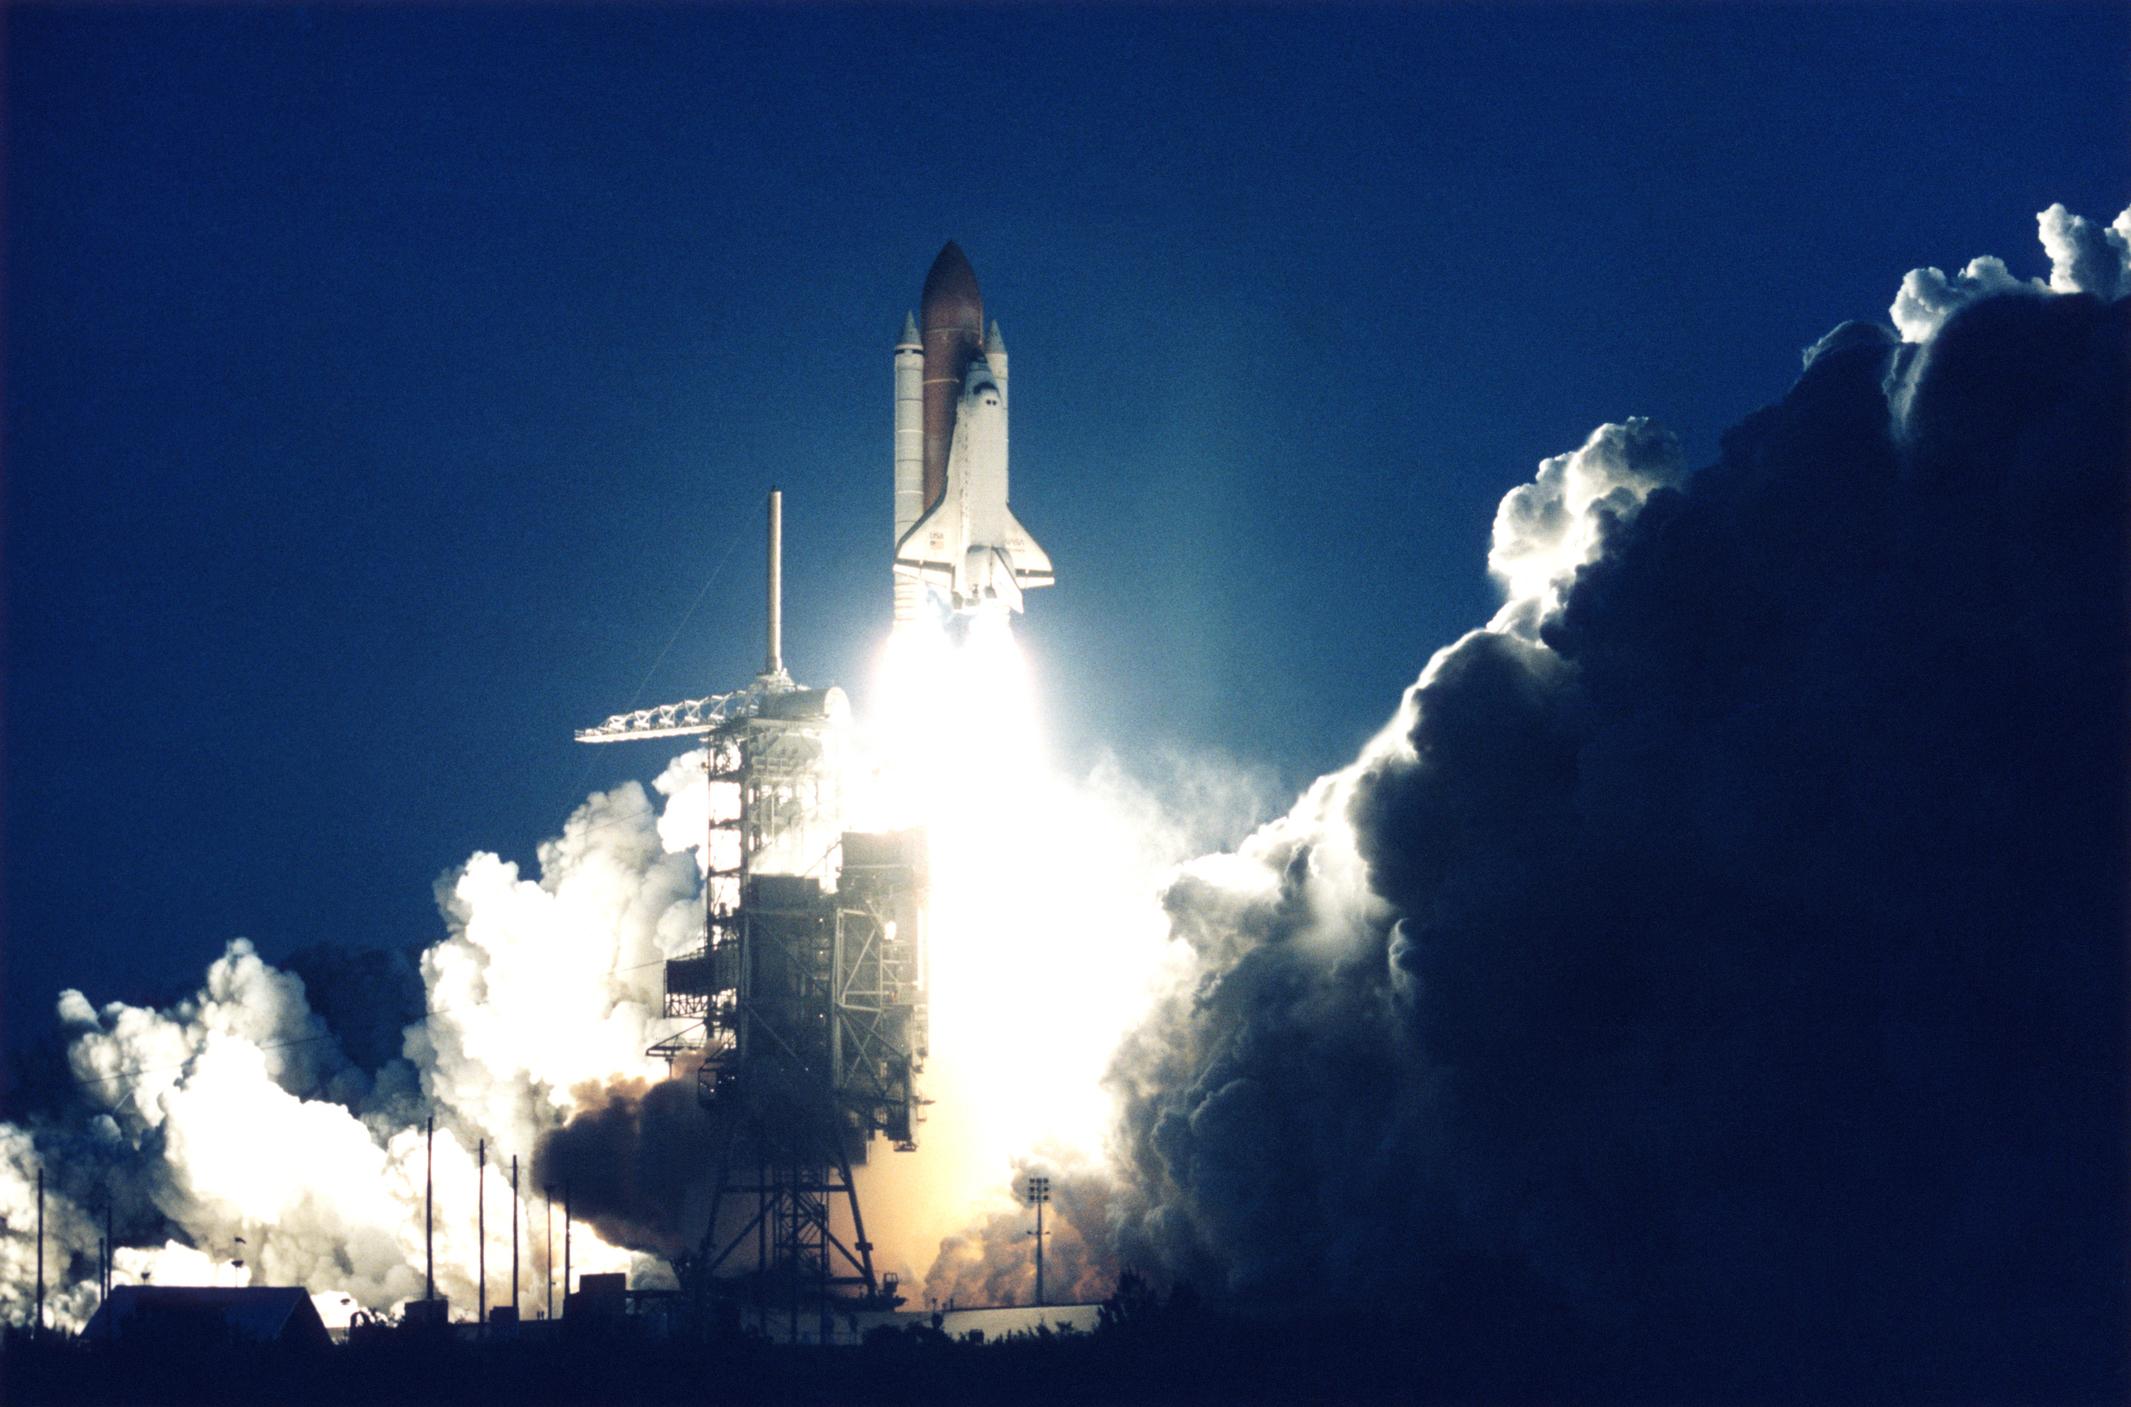 A space shuttle launching.